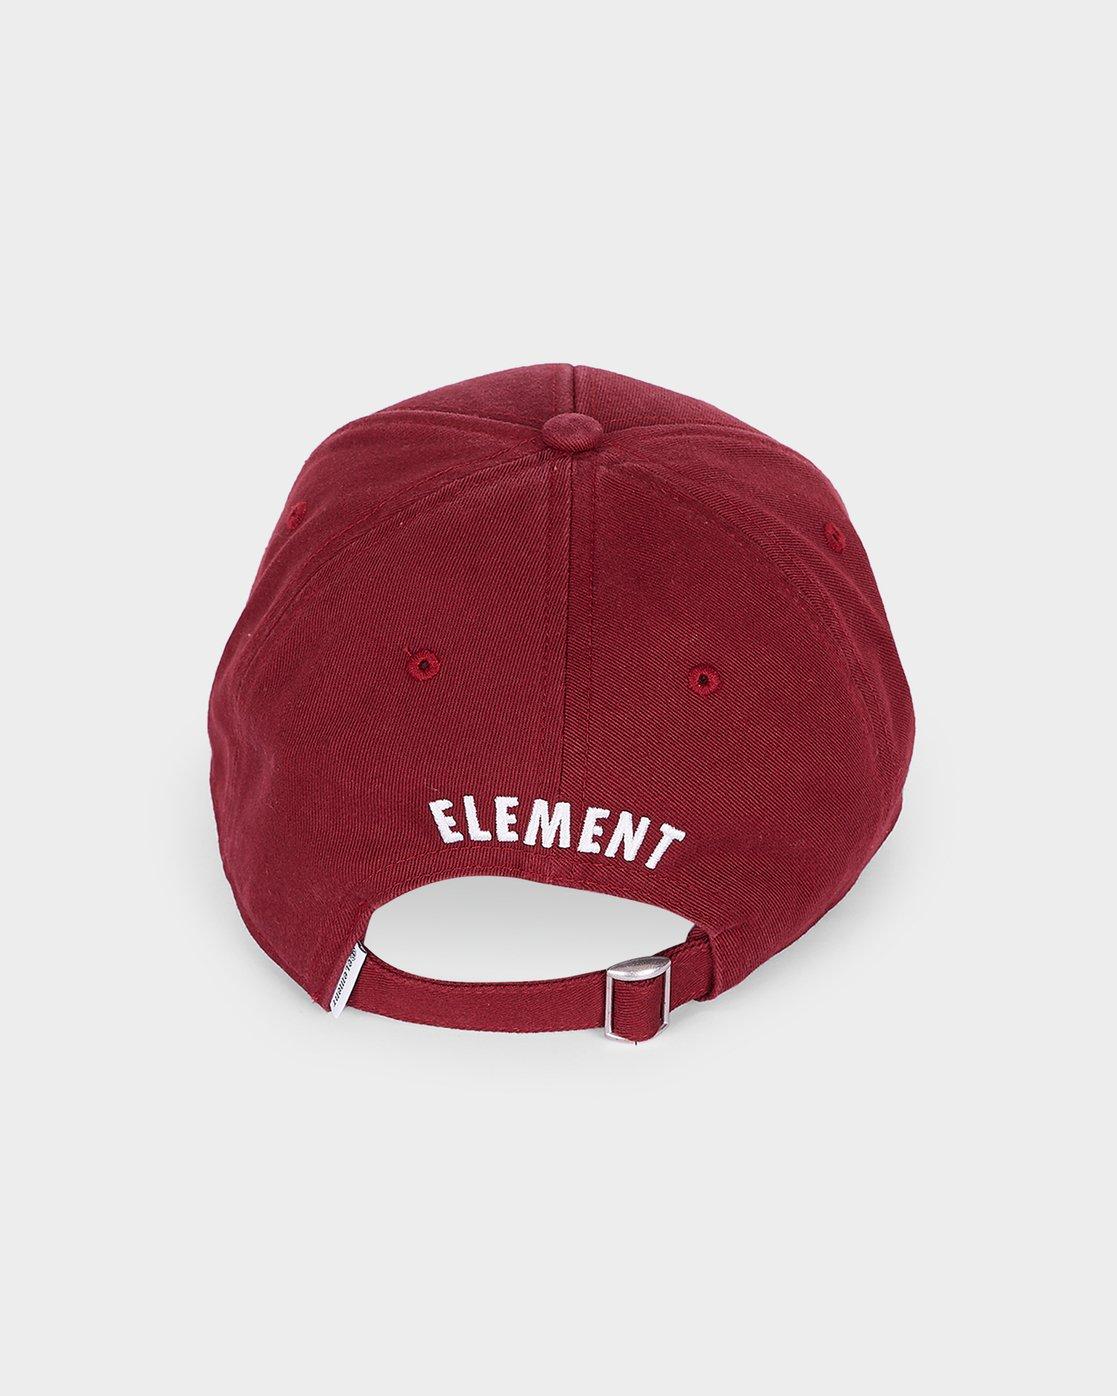 1 ELEMENT SKATE CAP  283604 Element